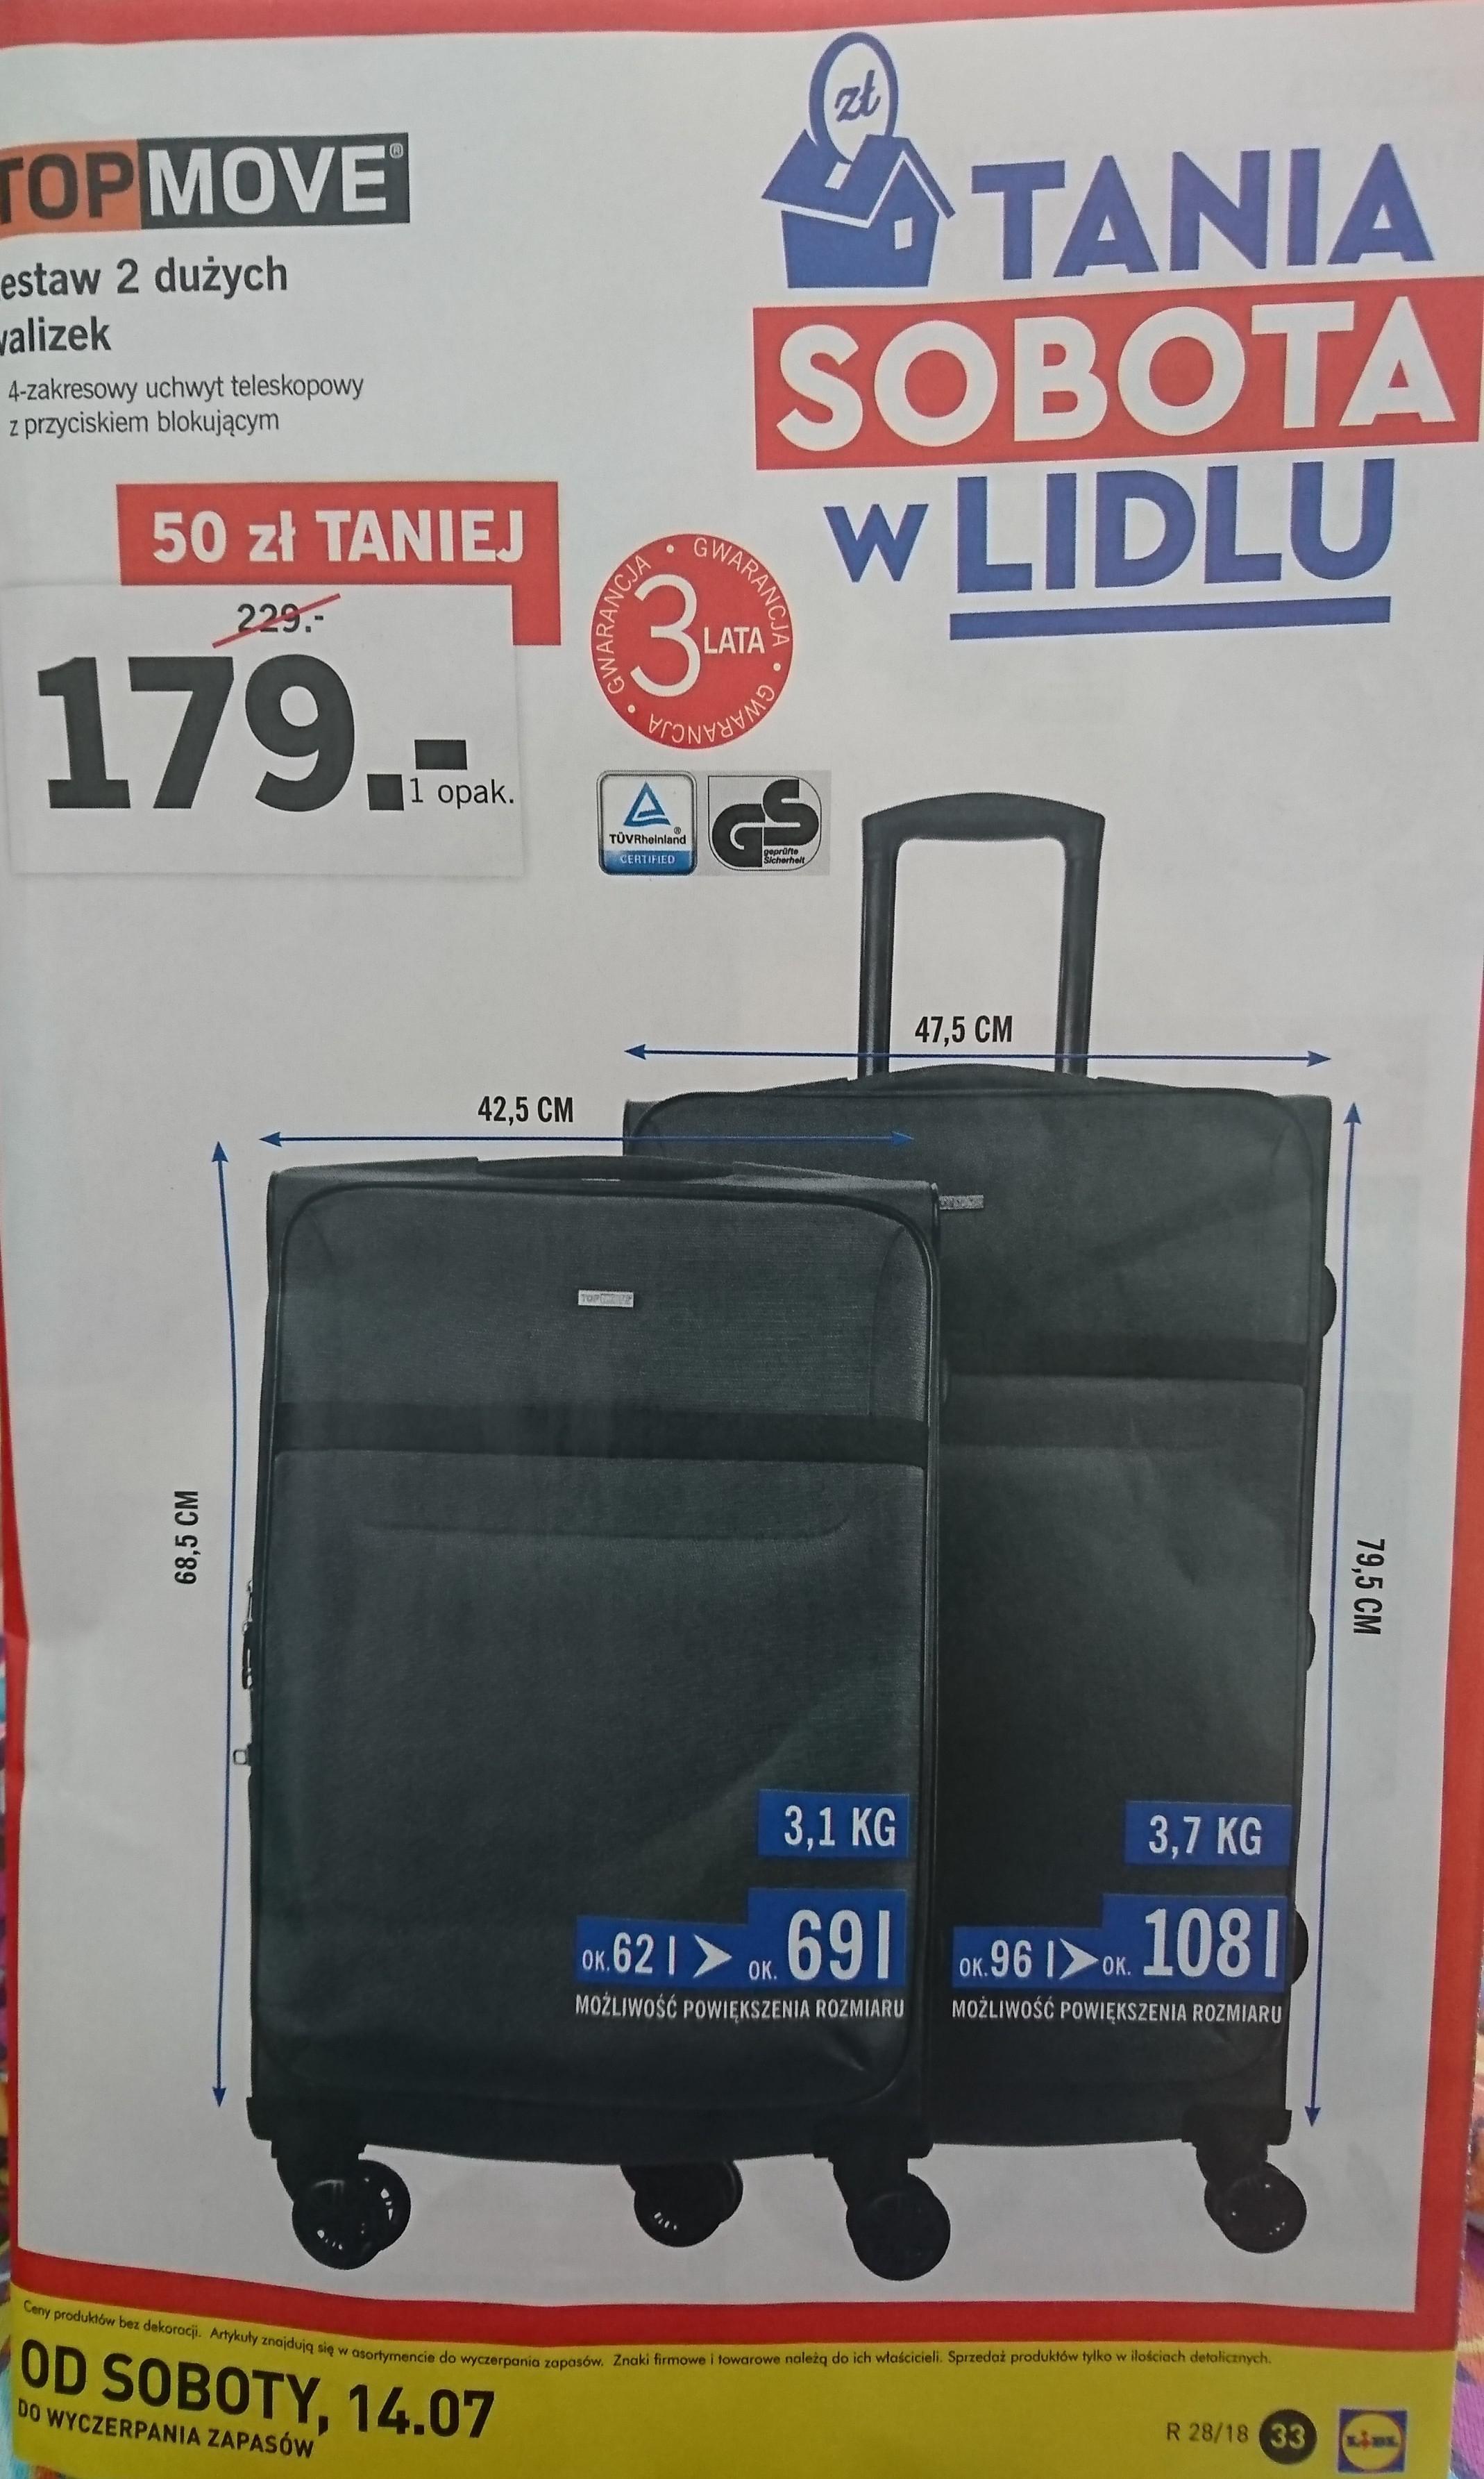 Tani sobota w Lidlu komplet dwóch walizek Top Move